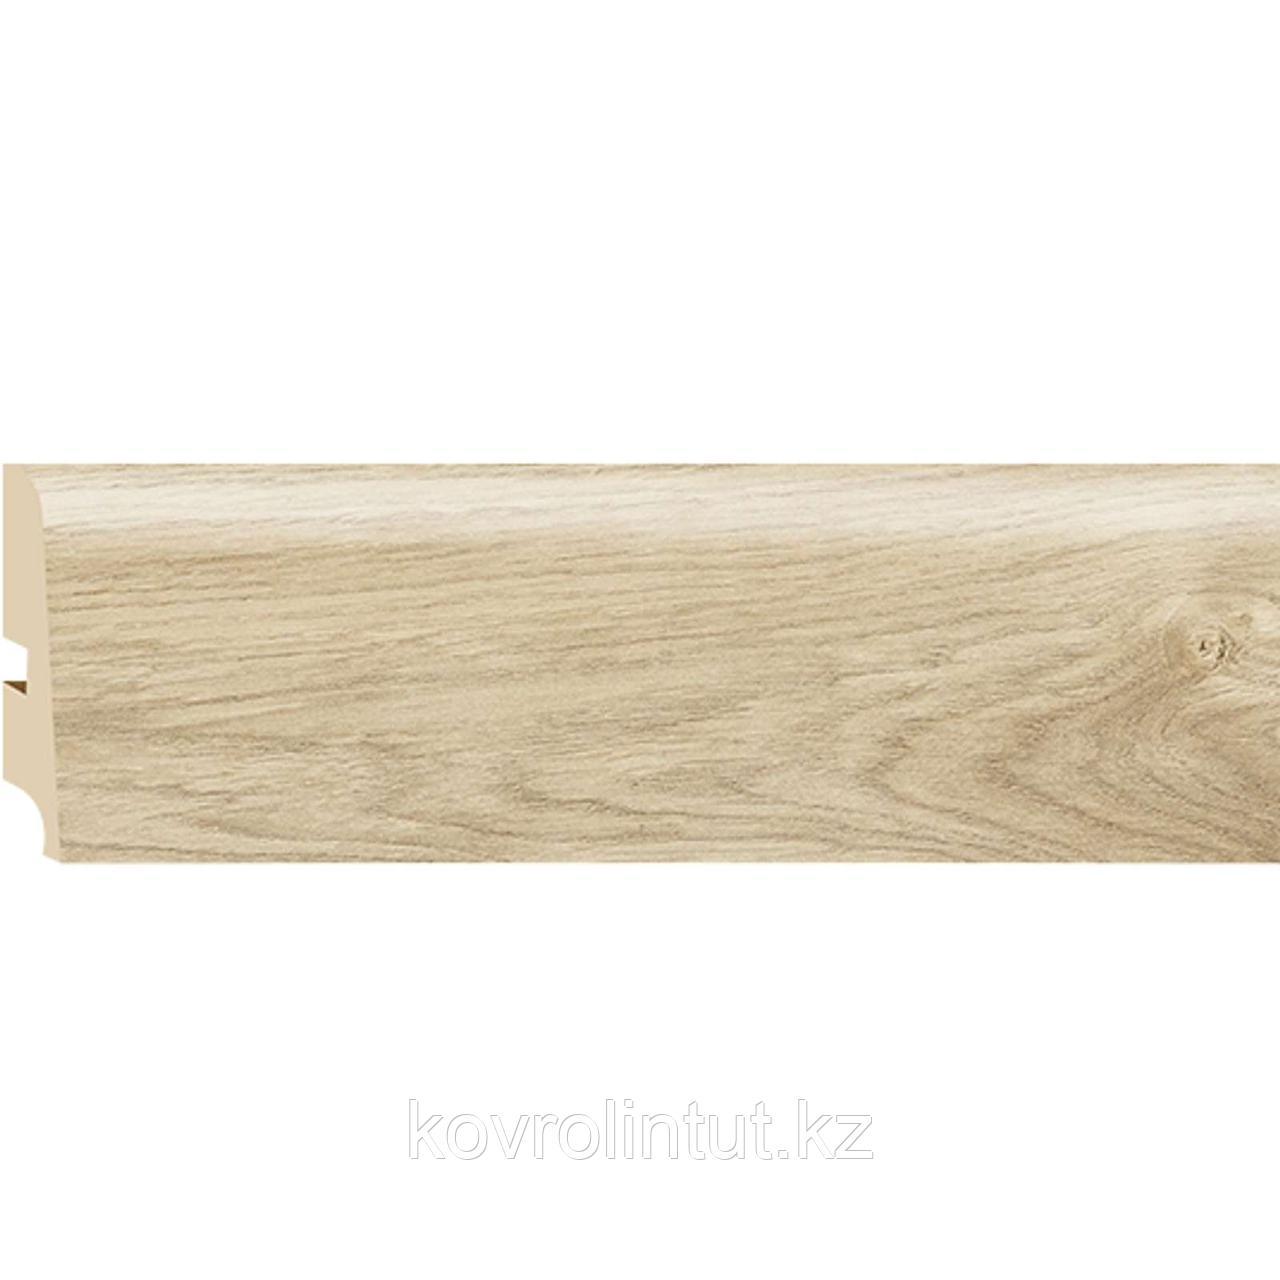 Плинтус Kronopol P85 4574 Eagle Oak, 2500х85х16мм, 9шт/уп